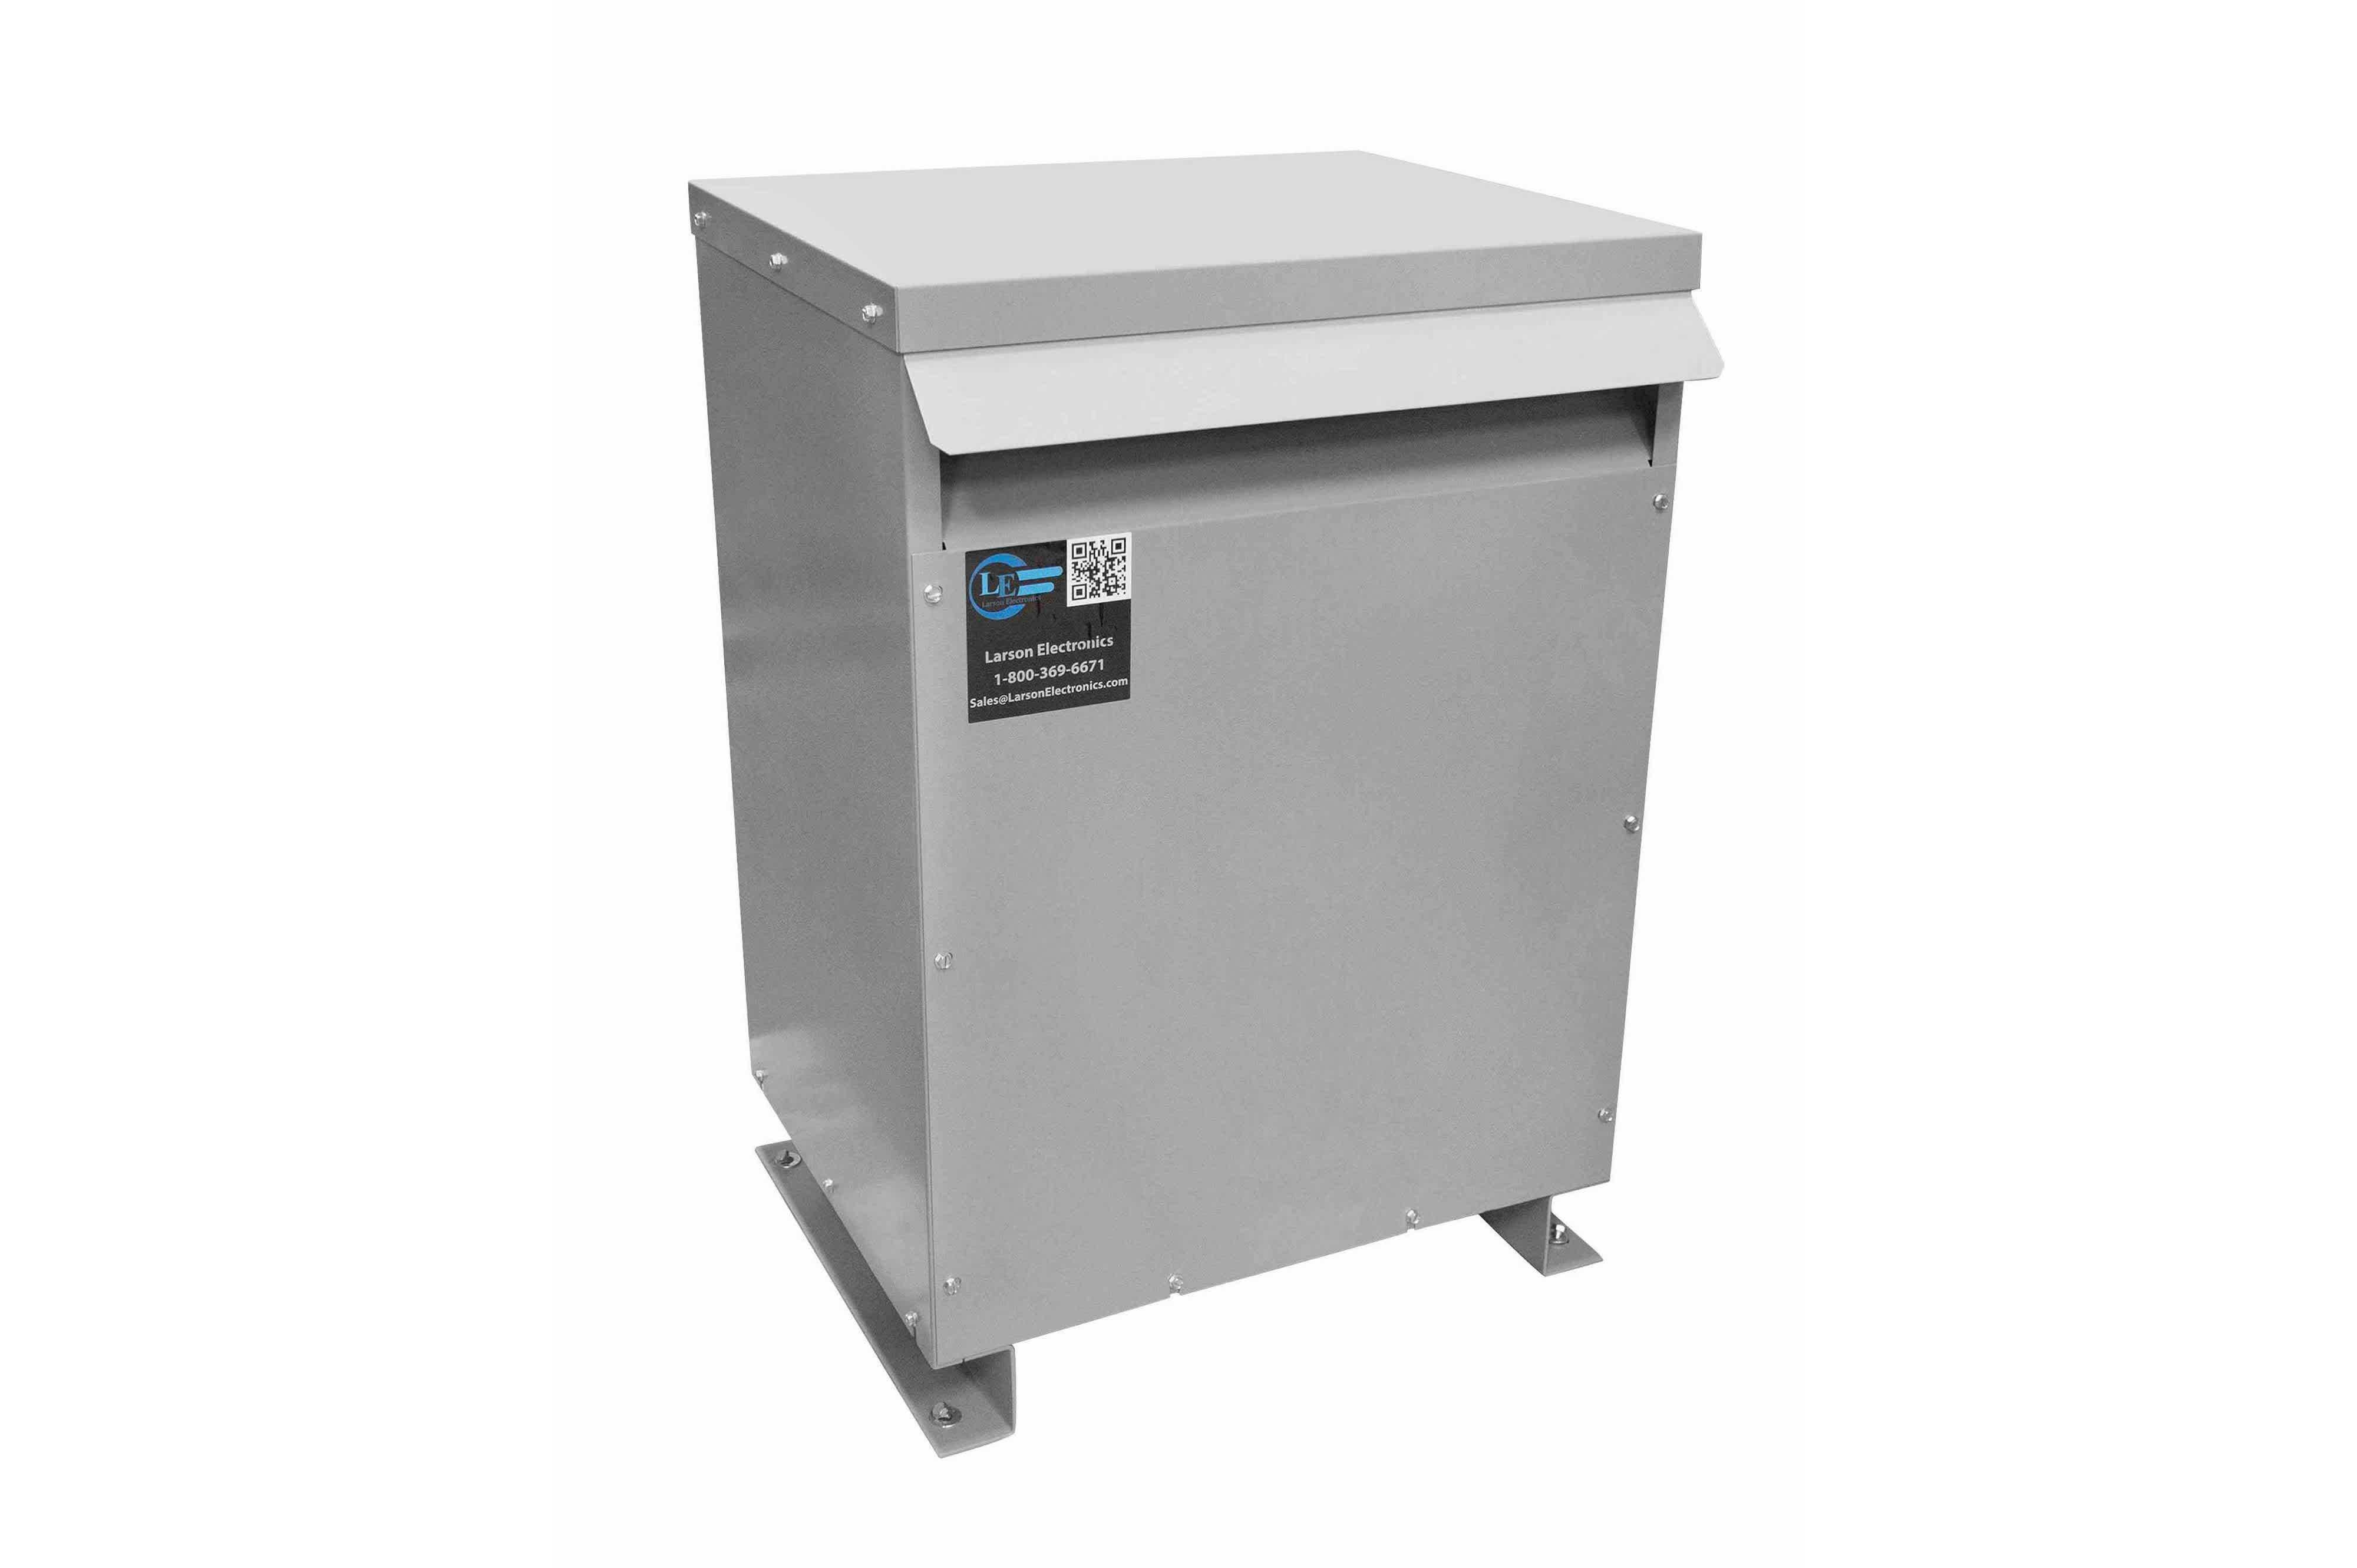 12 kVA 3PH Isolation Transformer, 415V Wye Primary, 208Y/120 Wye-N Secondary, N3R, Ventilated, 60 Hz